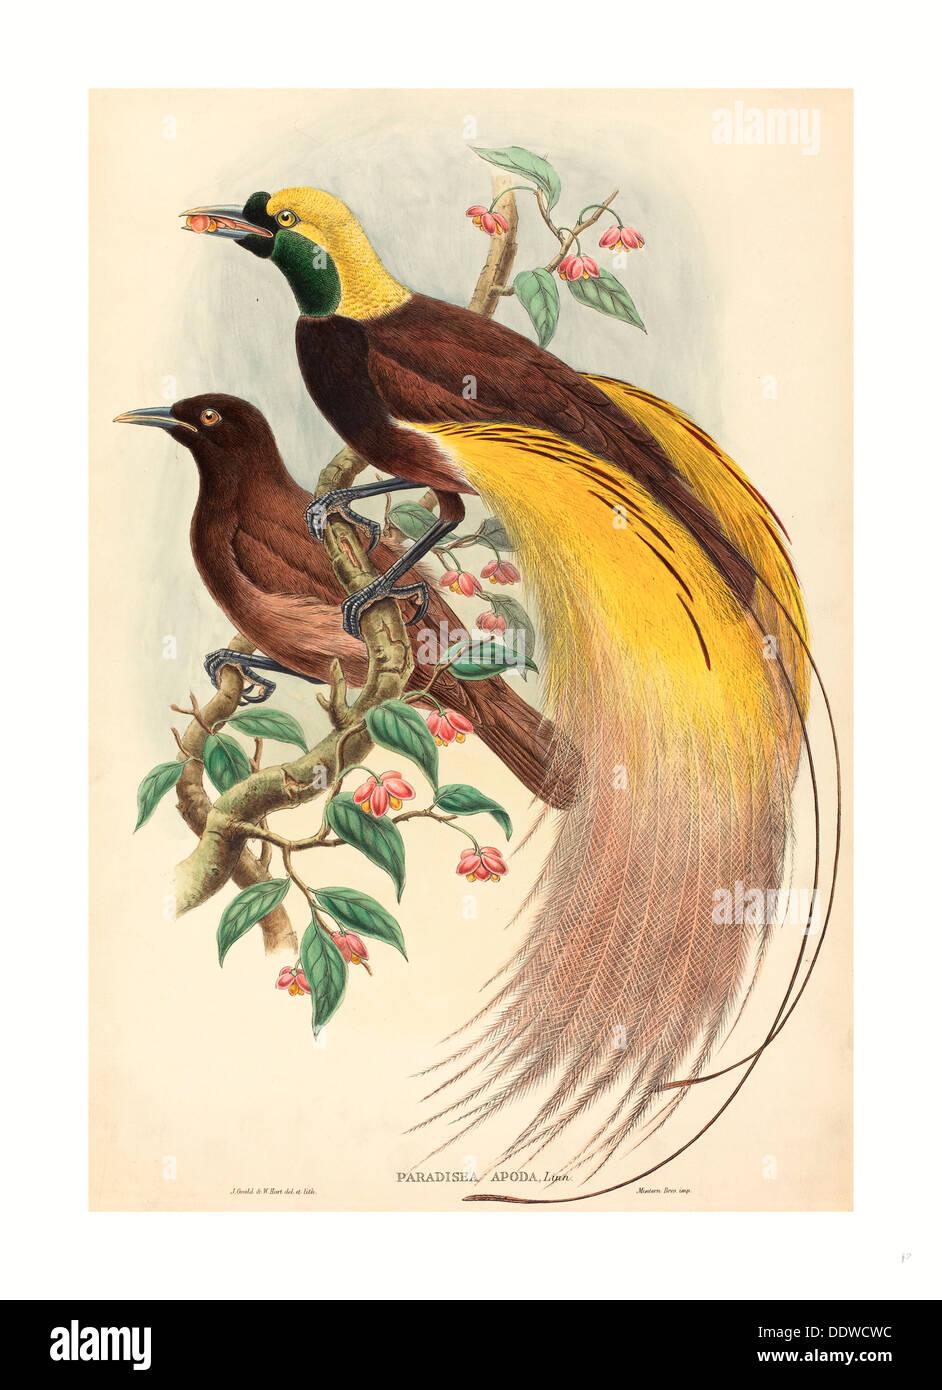 John Gould and W. Hart (British, 1804 - 1881 ), Bird of Paradise (Paradisea apoda), published 1875 1888, hand colored Stock Foto